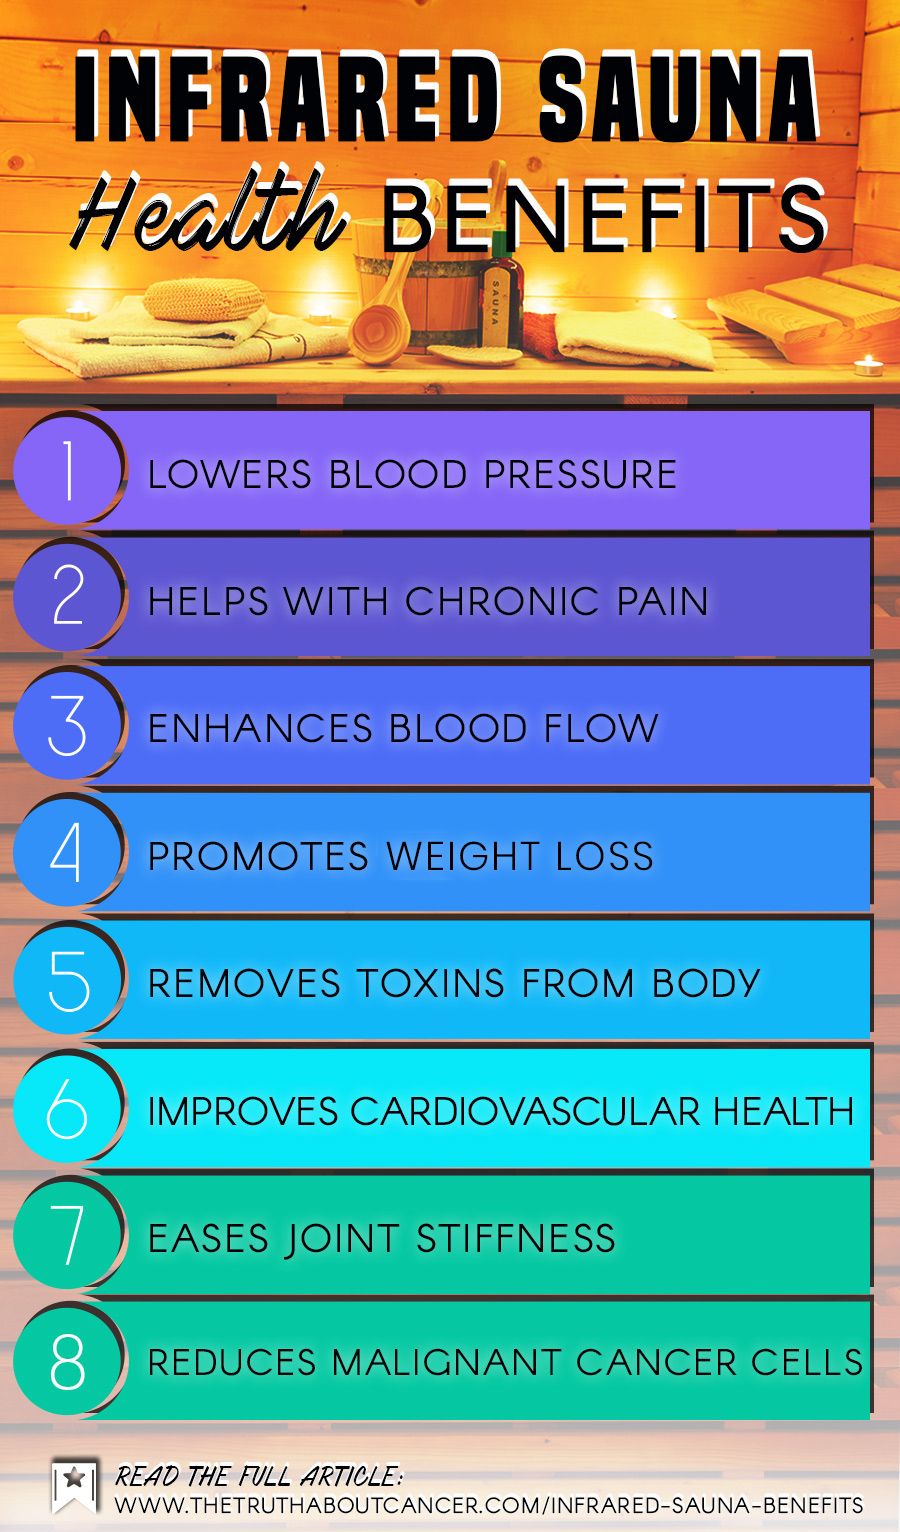 infrared sauna benefits infographic